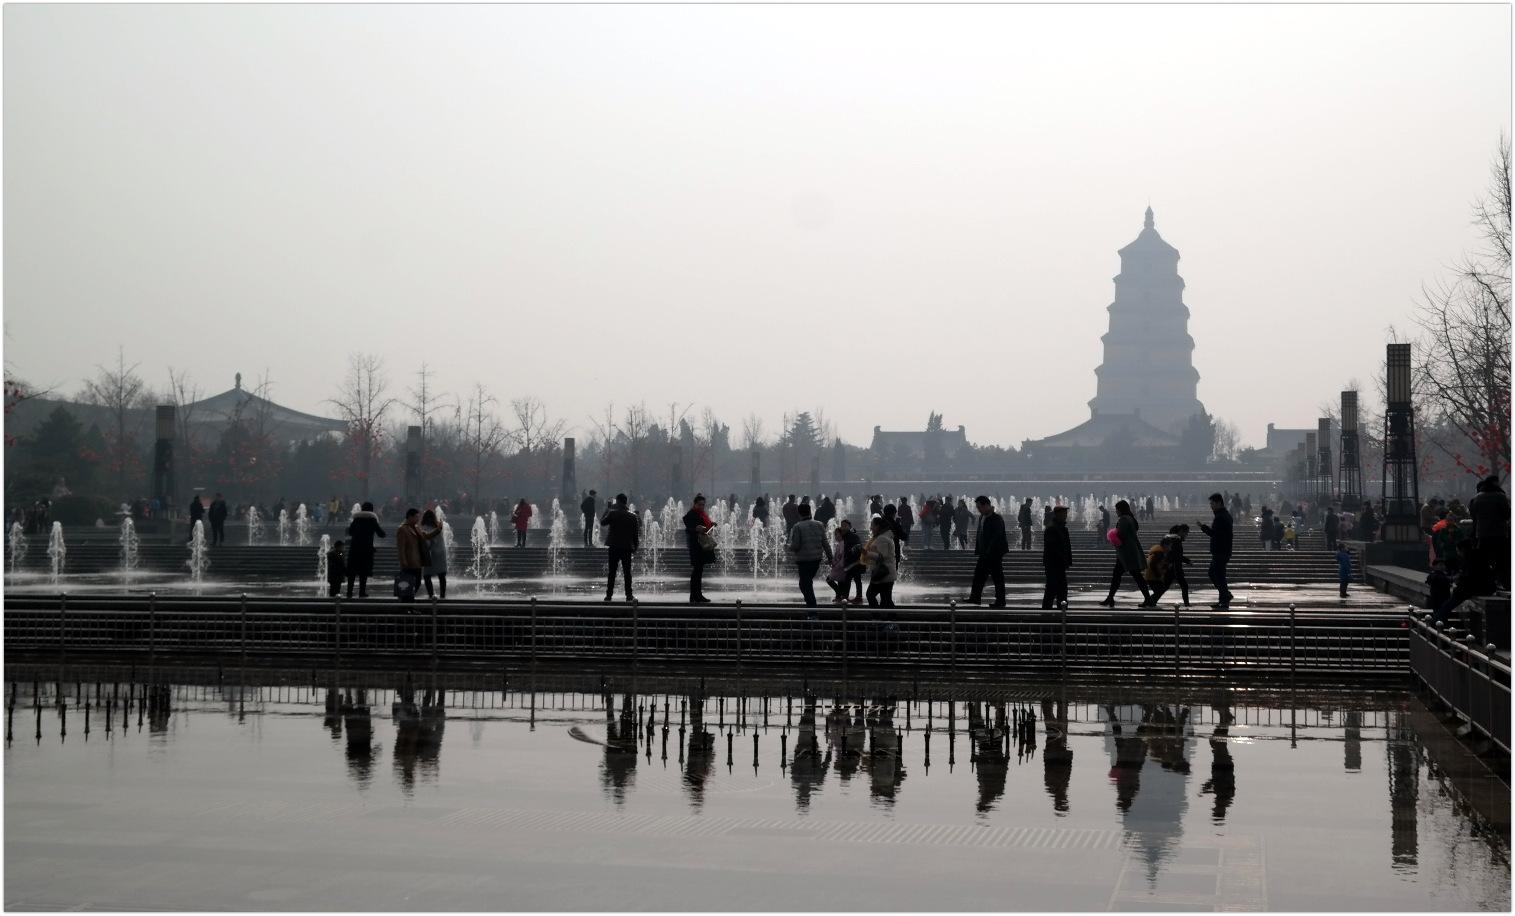 China - XiAn - Wild Goose Pagoda